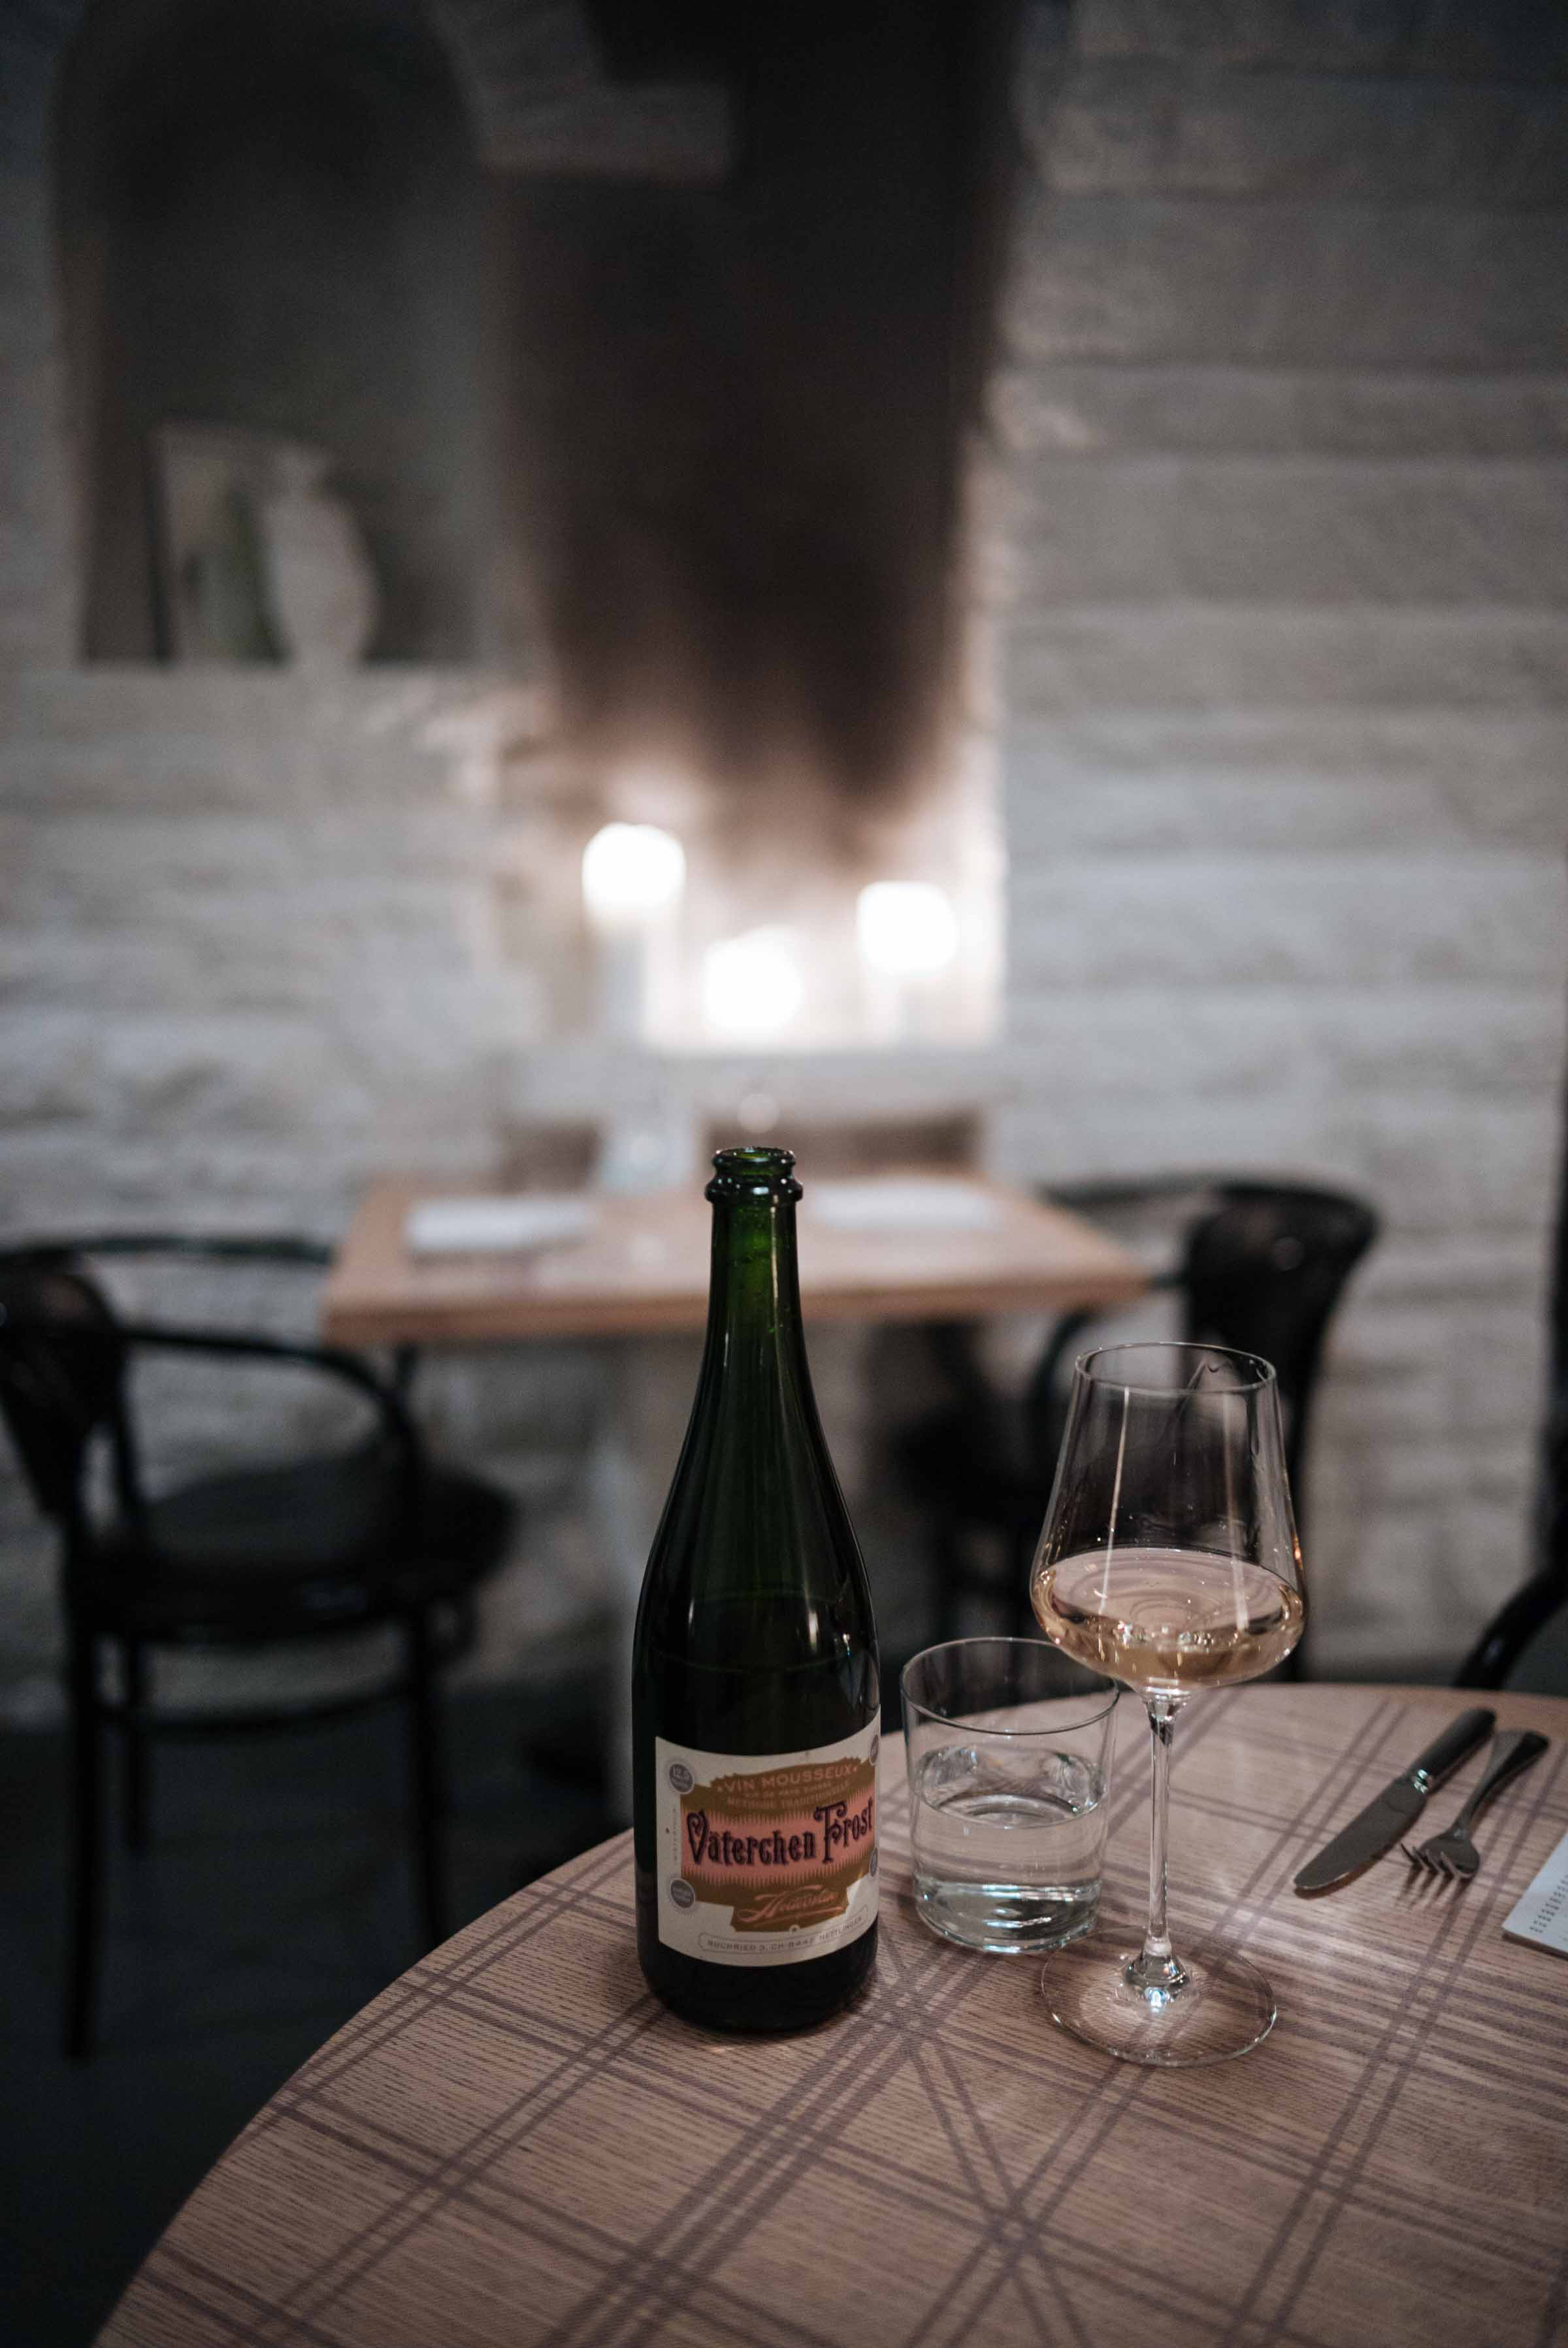 Zurich Restaurant Maison Manesse has a large natural wine list